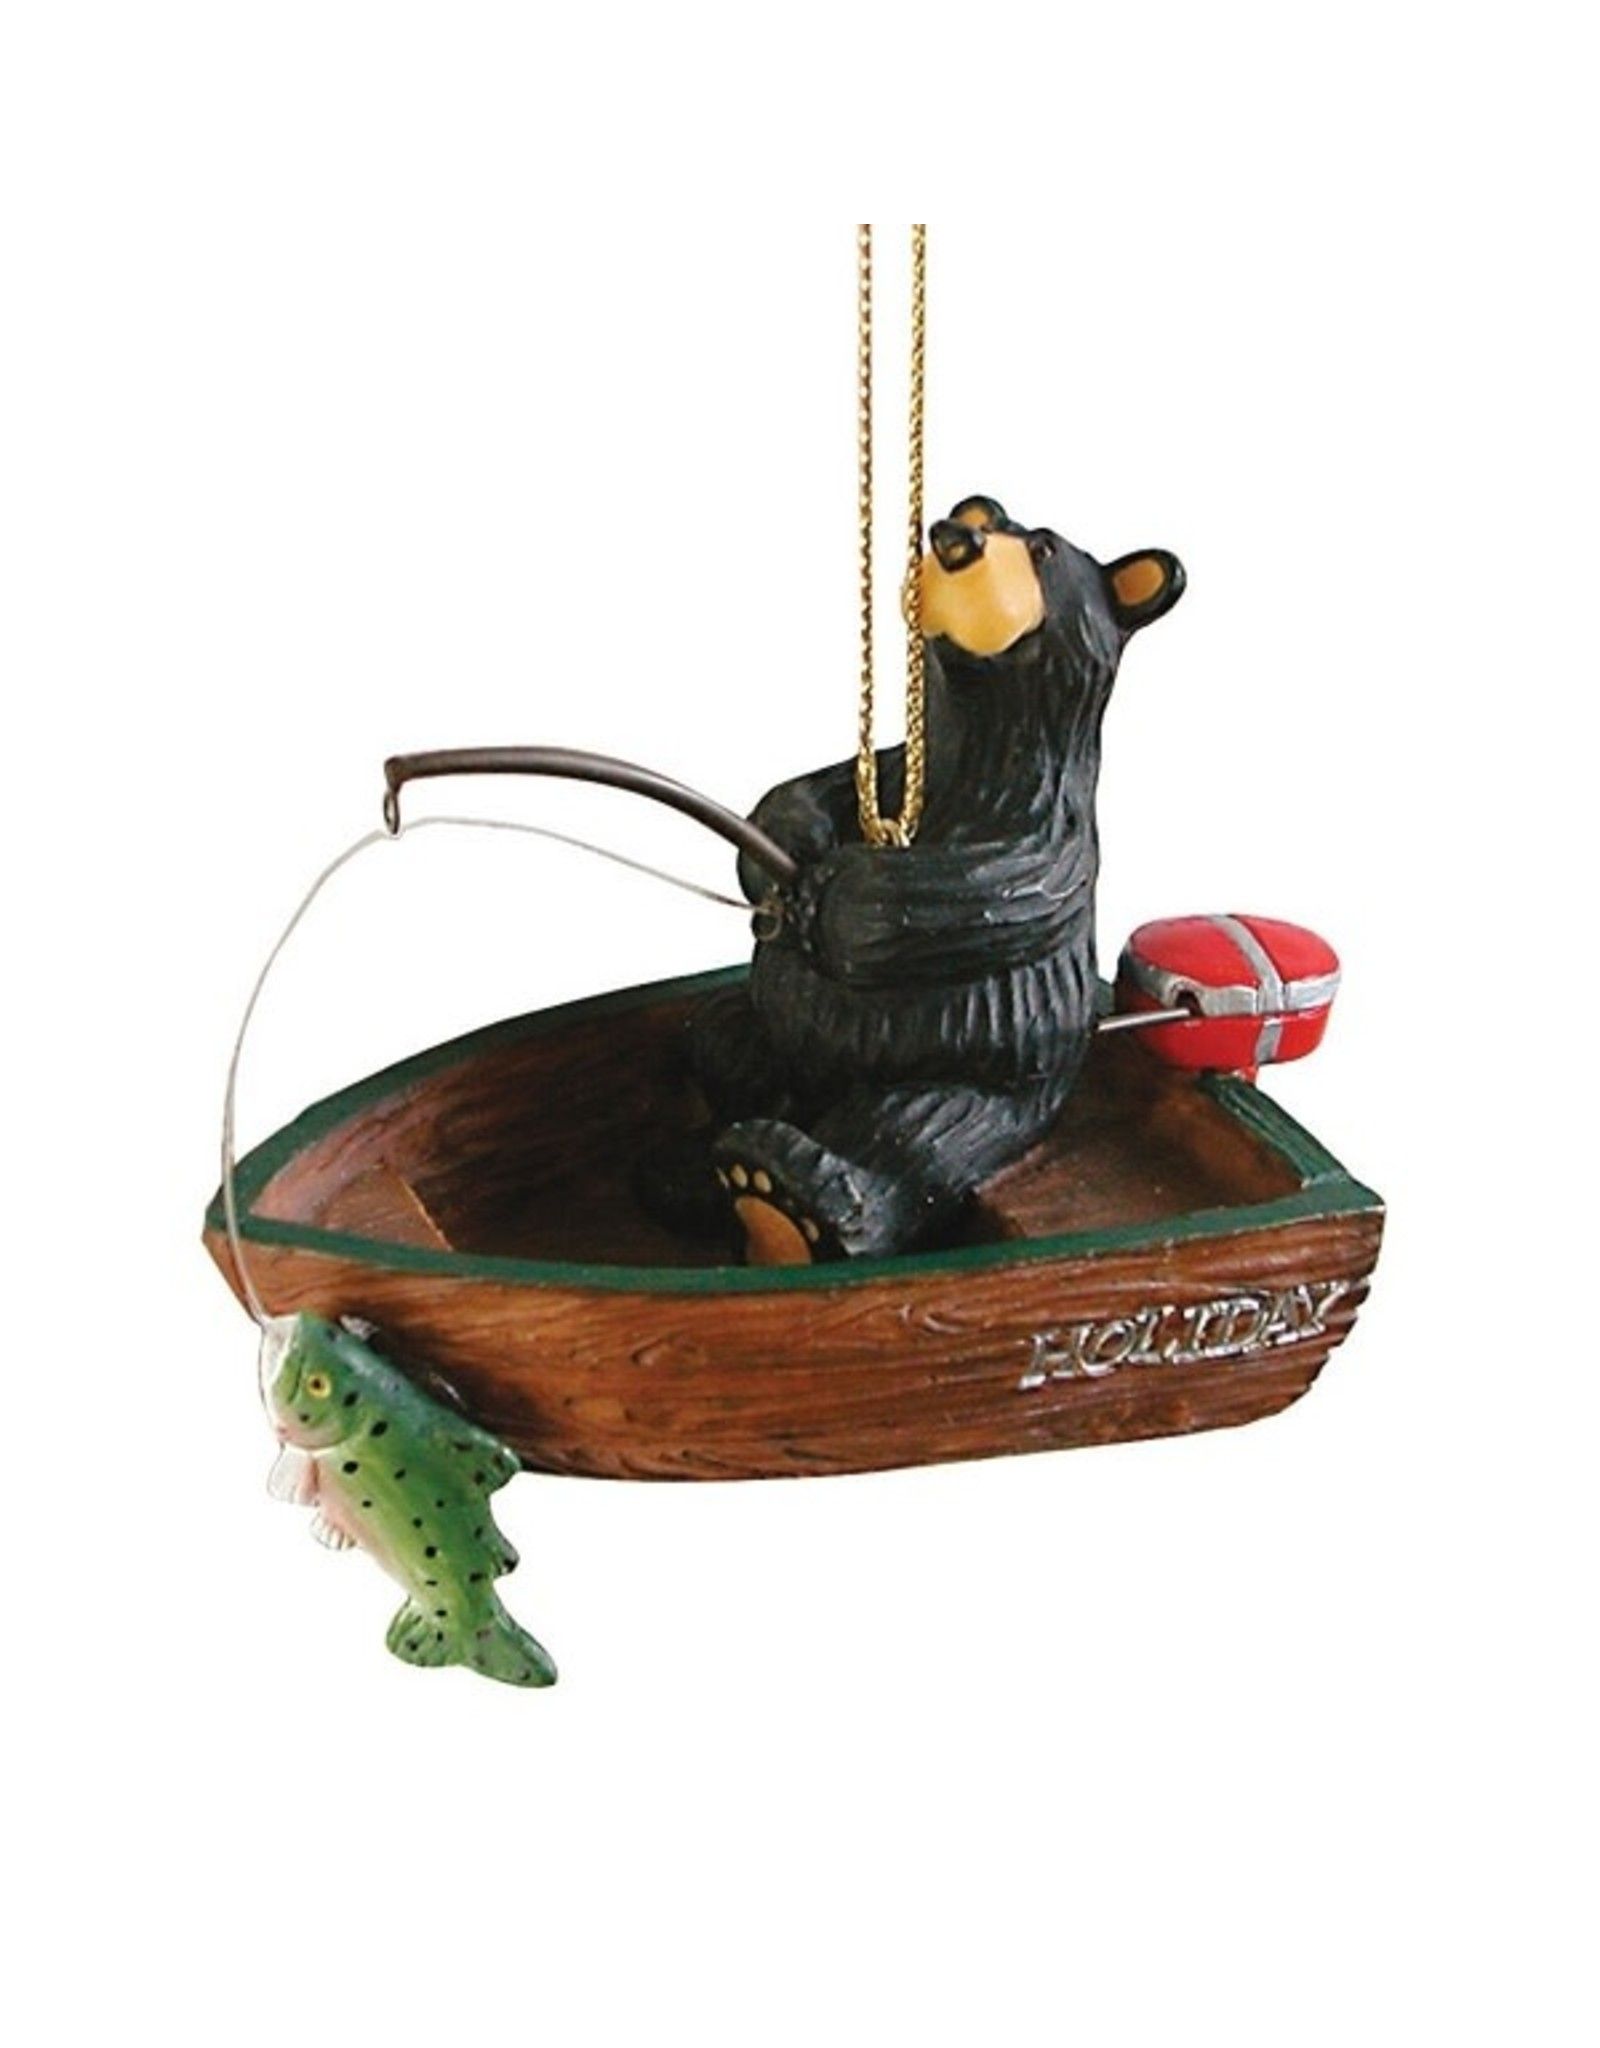 Demdaco FISHERBEAR BOAT ORNAMENT